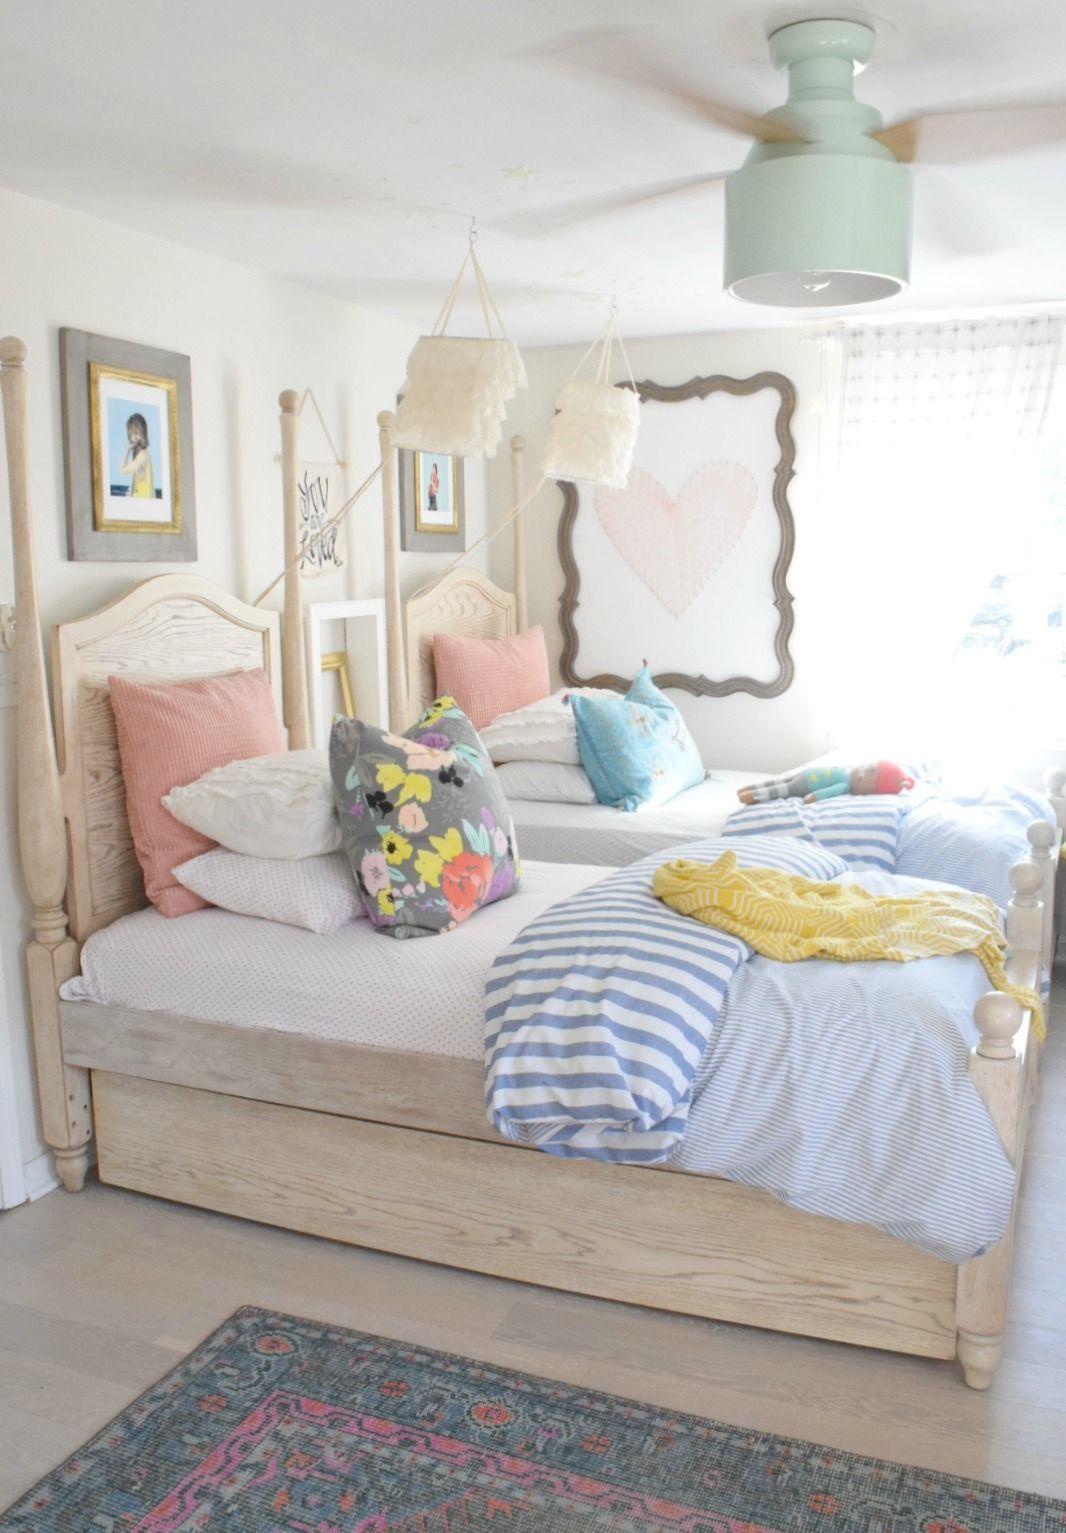 Summer Home Decor Ideas Our Summer Tour 2017 Nesting With Grace Home Decor Bedroom Kid Room Decor Summer Home Decor